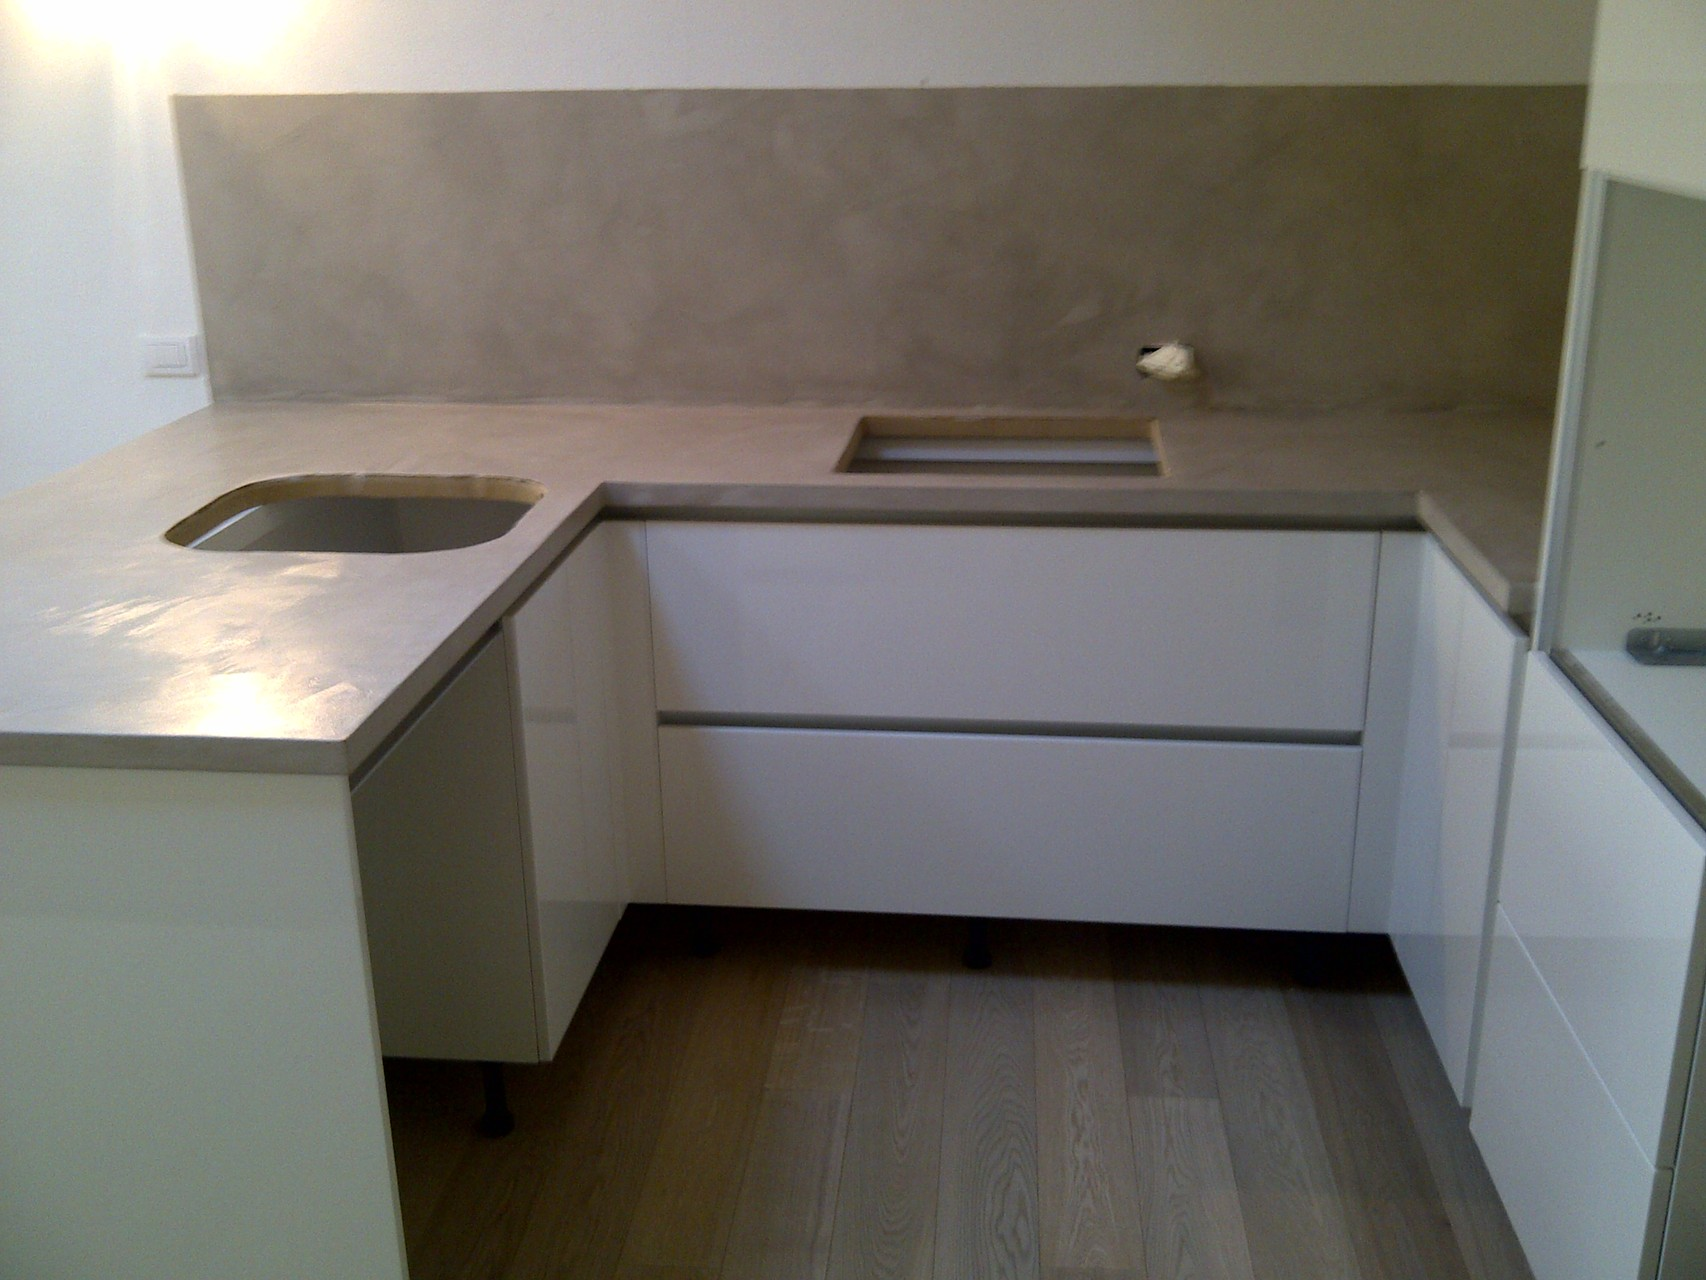 Rivestimenti per la cucina emilresina pavimenti e - Rivestimenti in resina per cucina ...